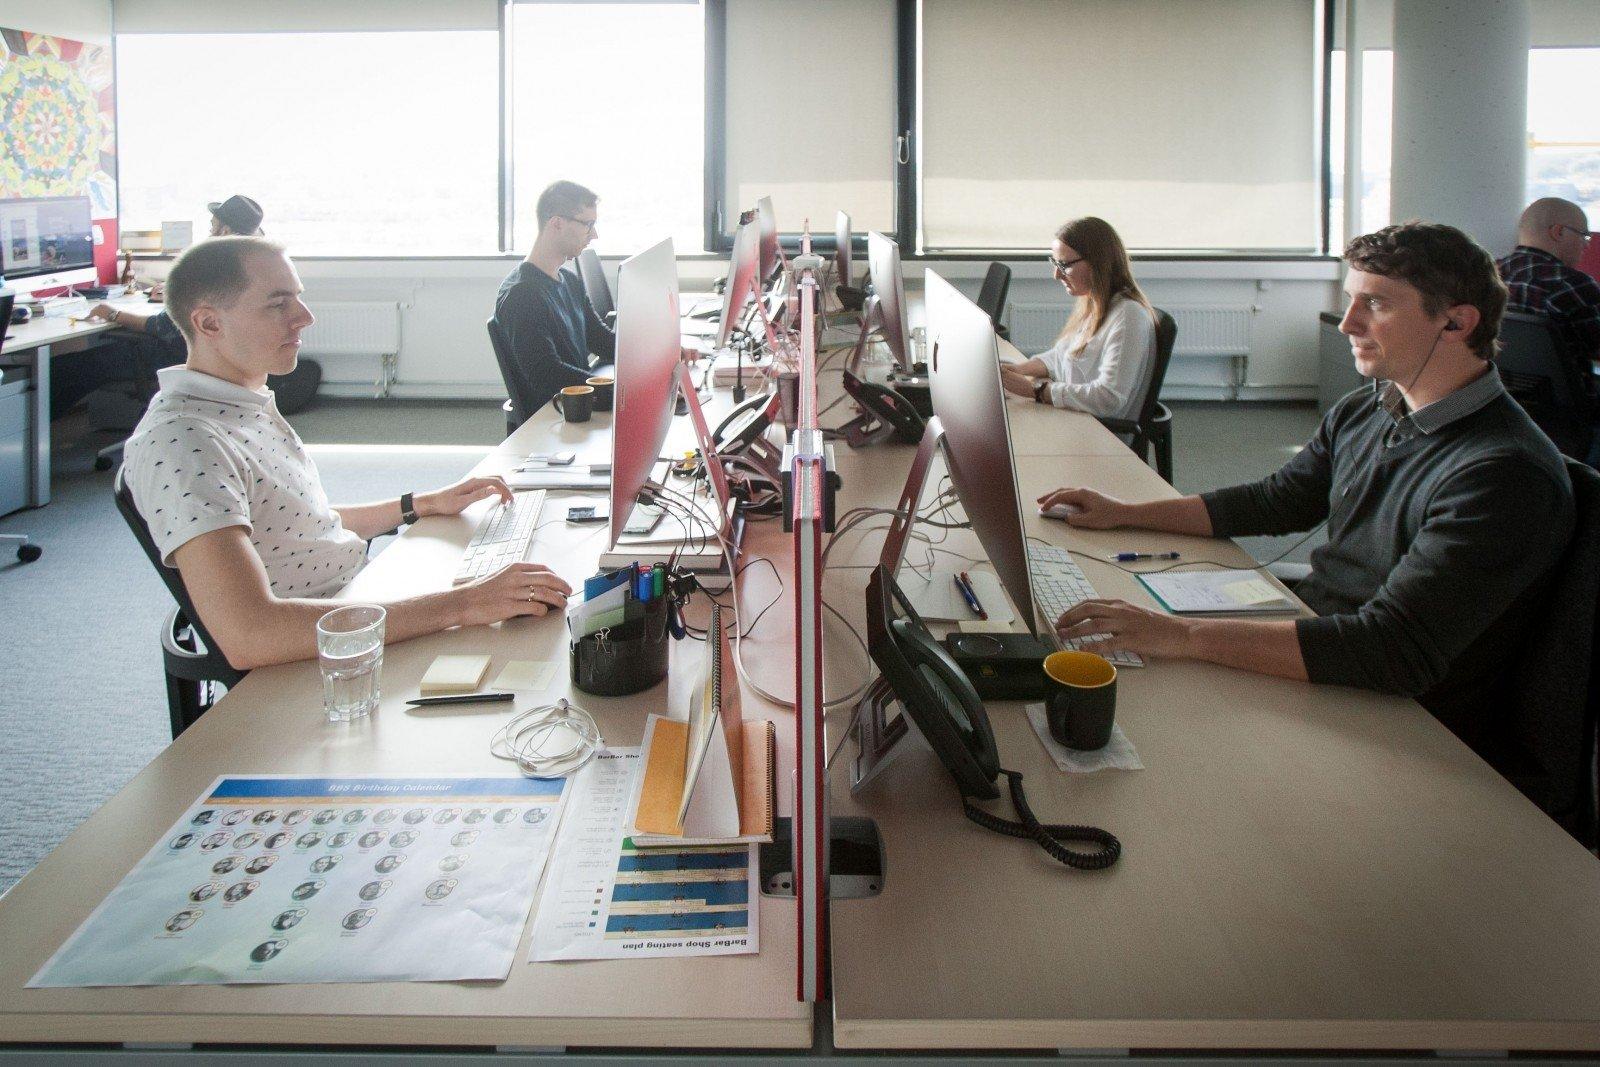 Bureau De Western Union : Lithuania eases intra company transfers of non eu workers en lfi